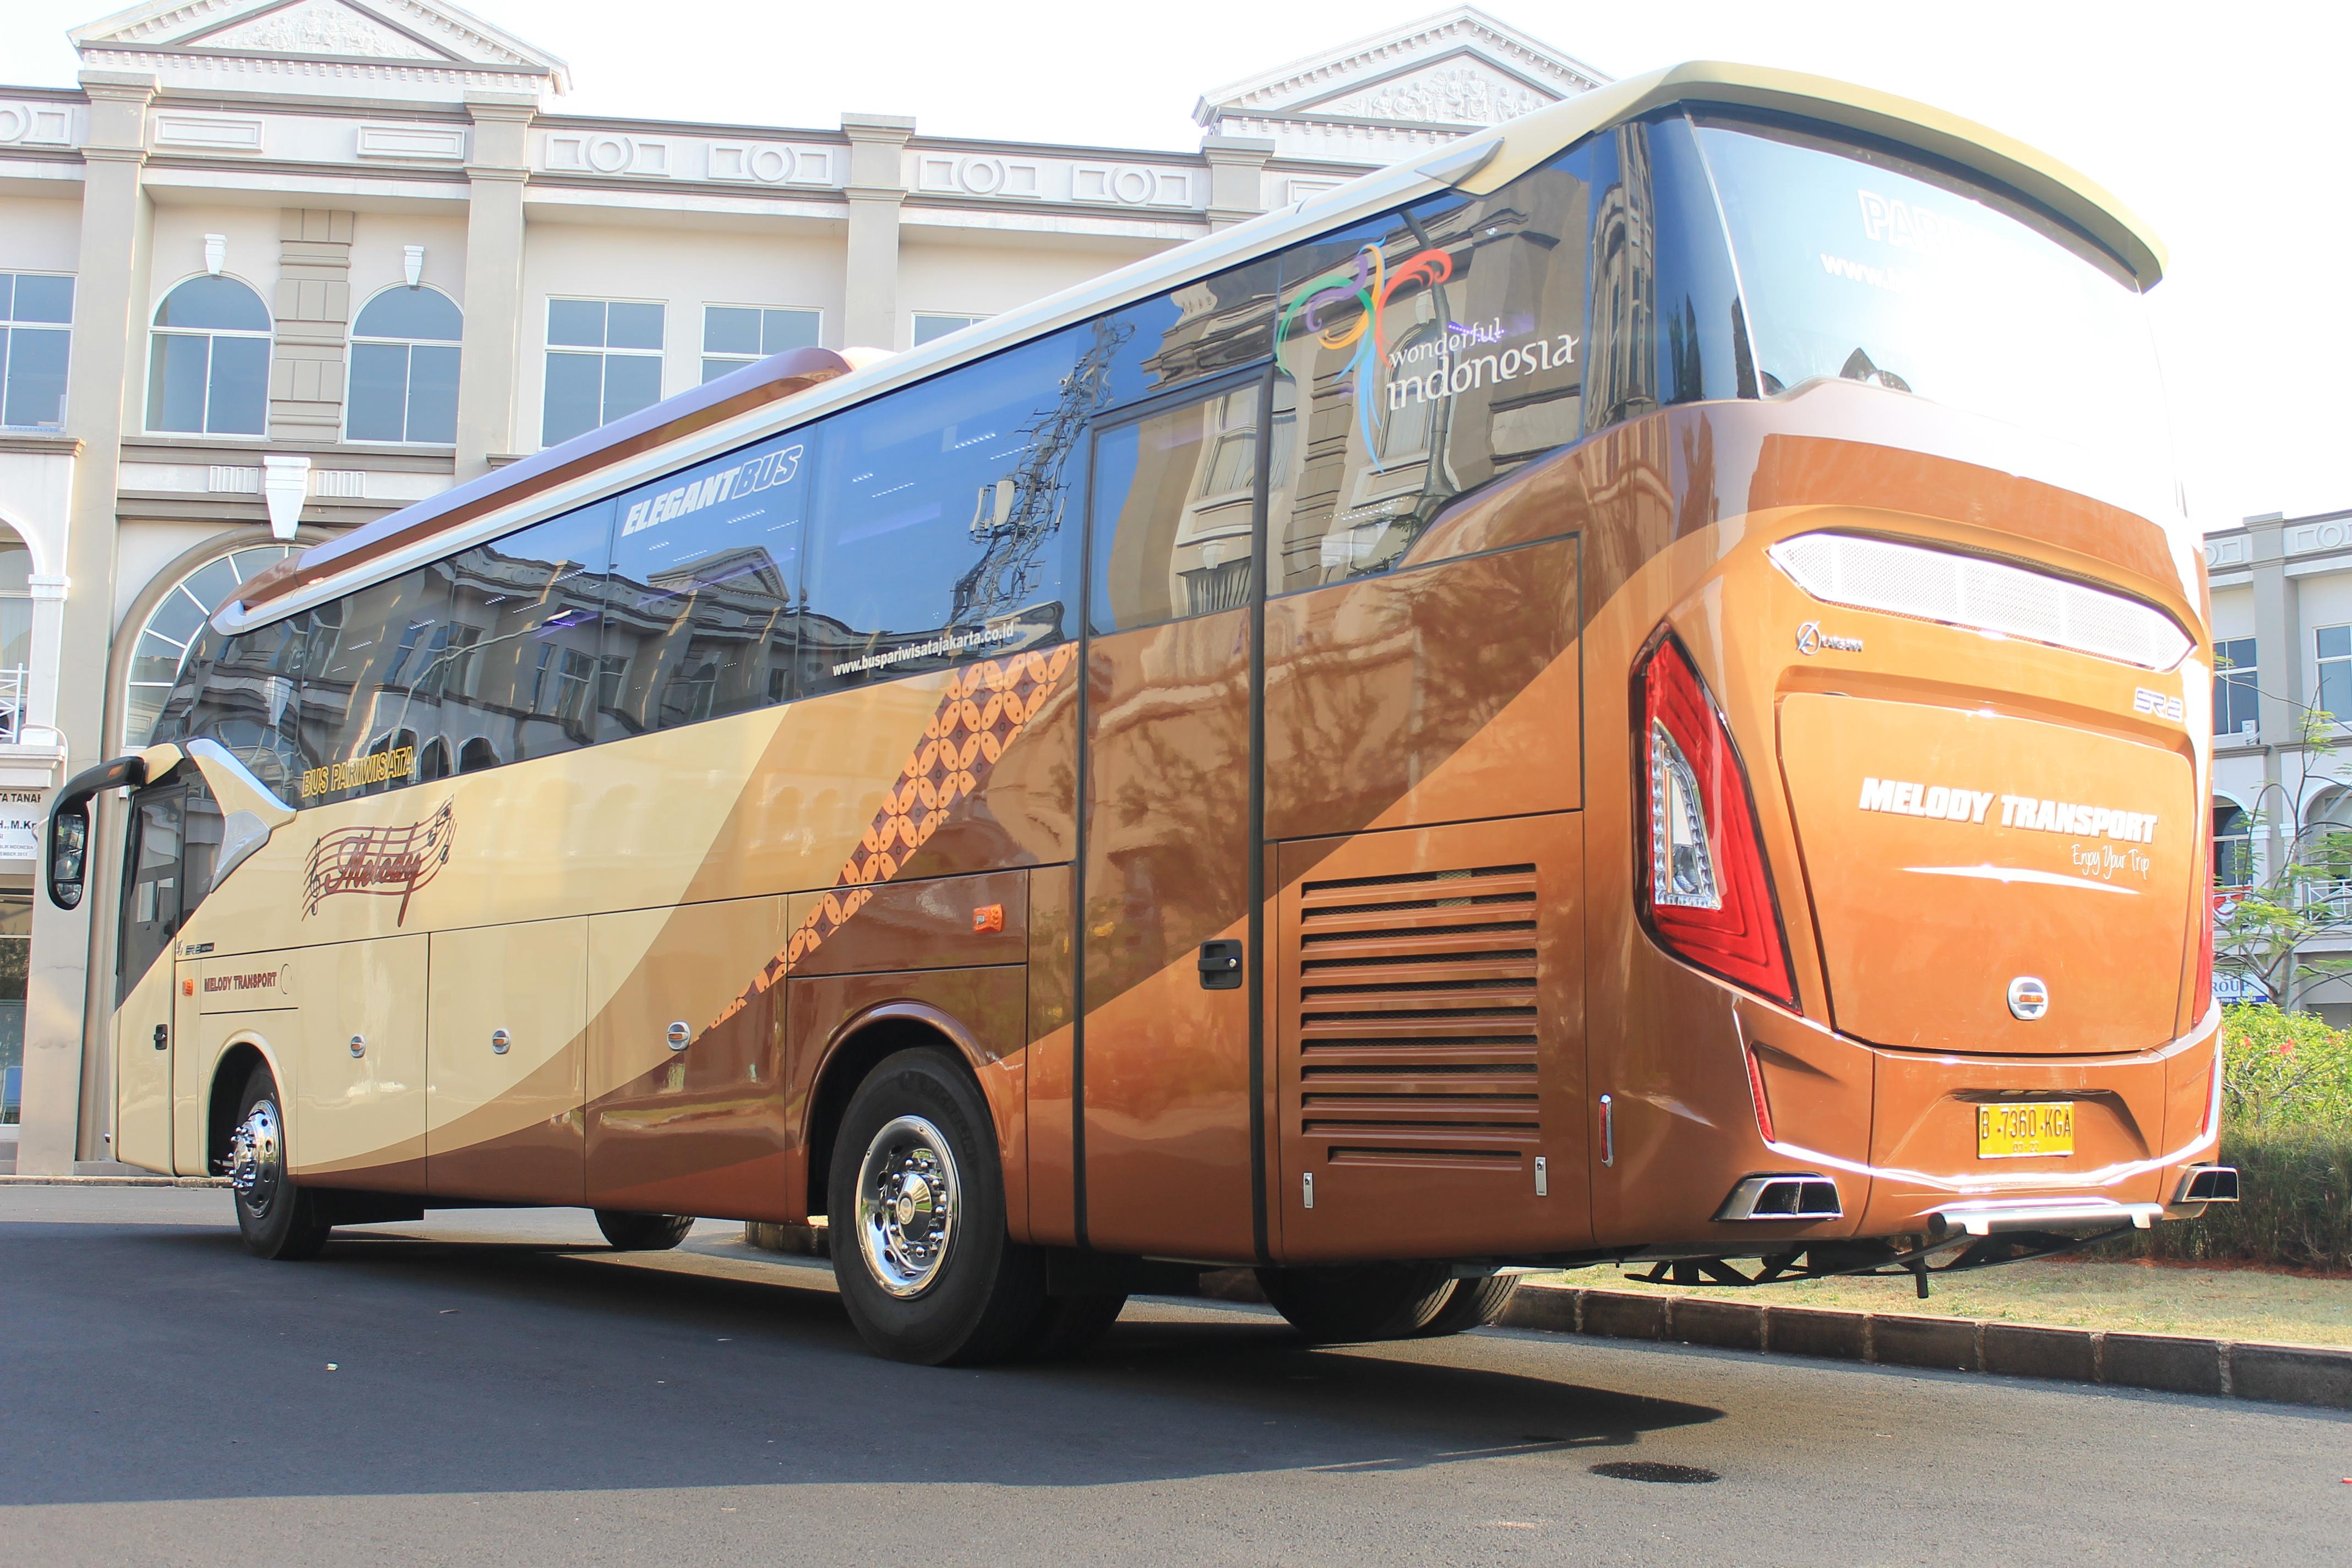 sewa bus pariwisata terbaru di jakarta hdd shd